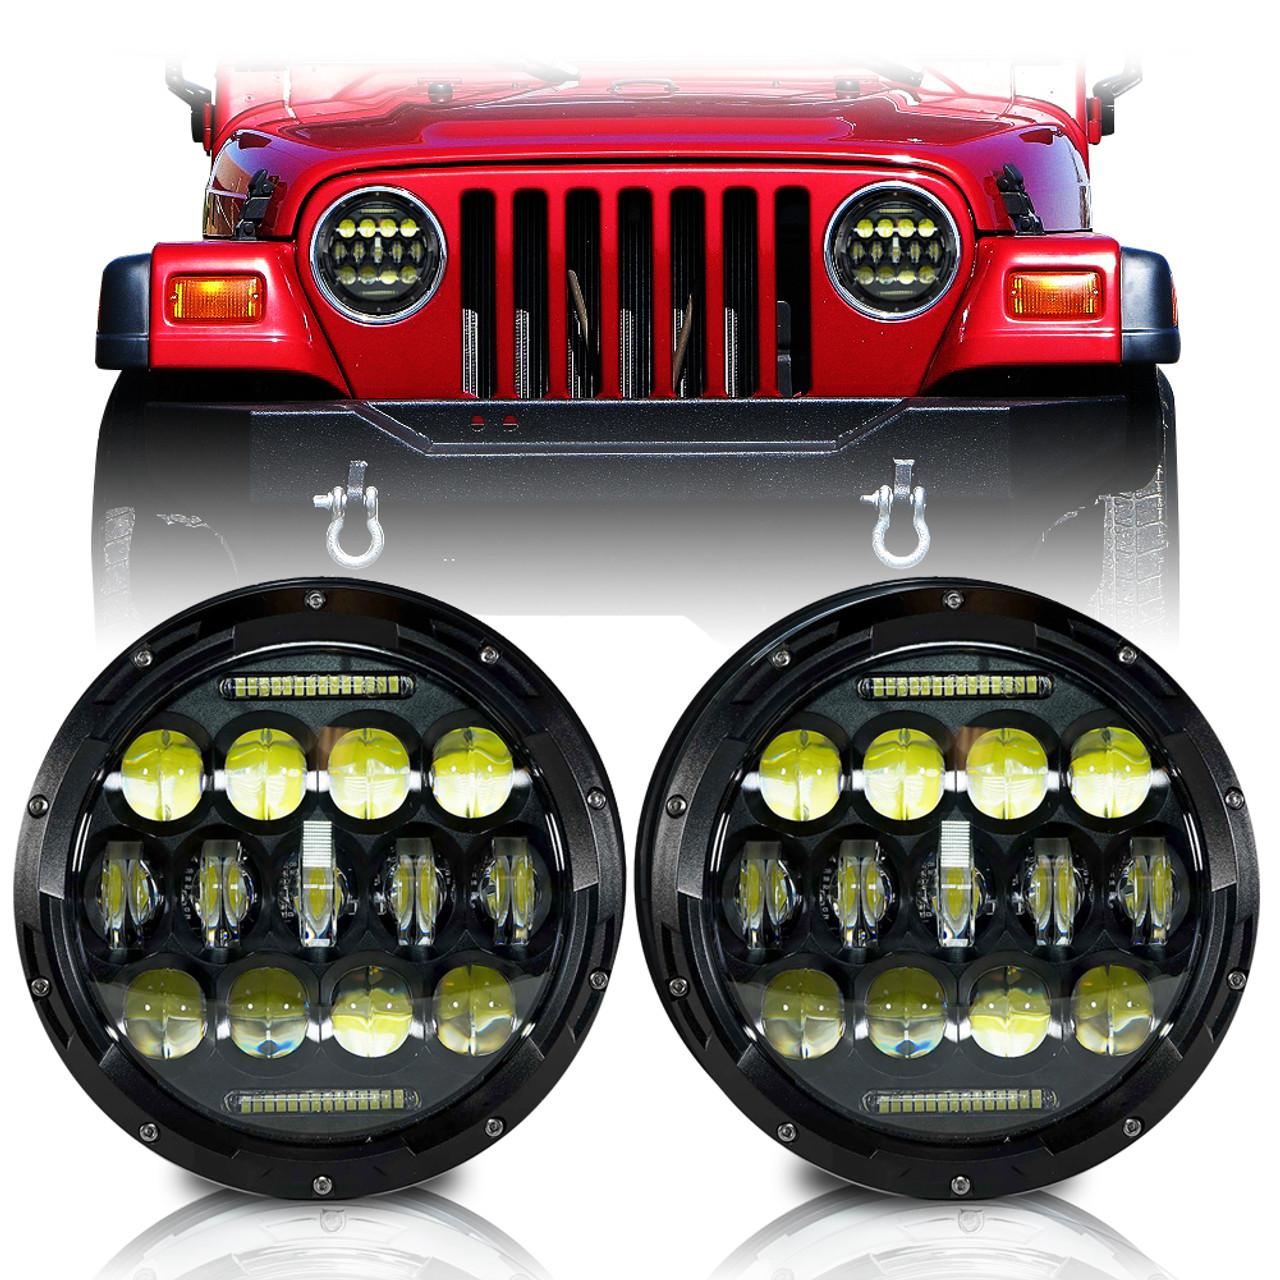 xpe honeycomb array black led headlights for wrangler 1996-2017